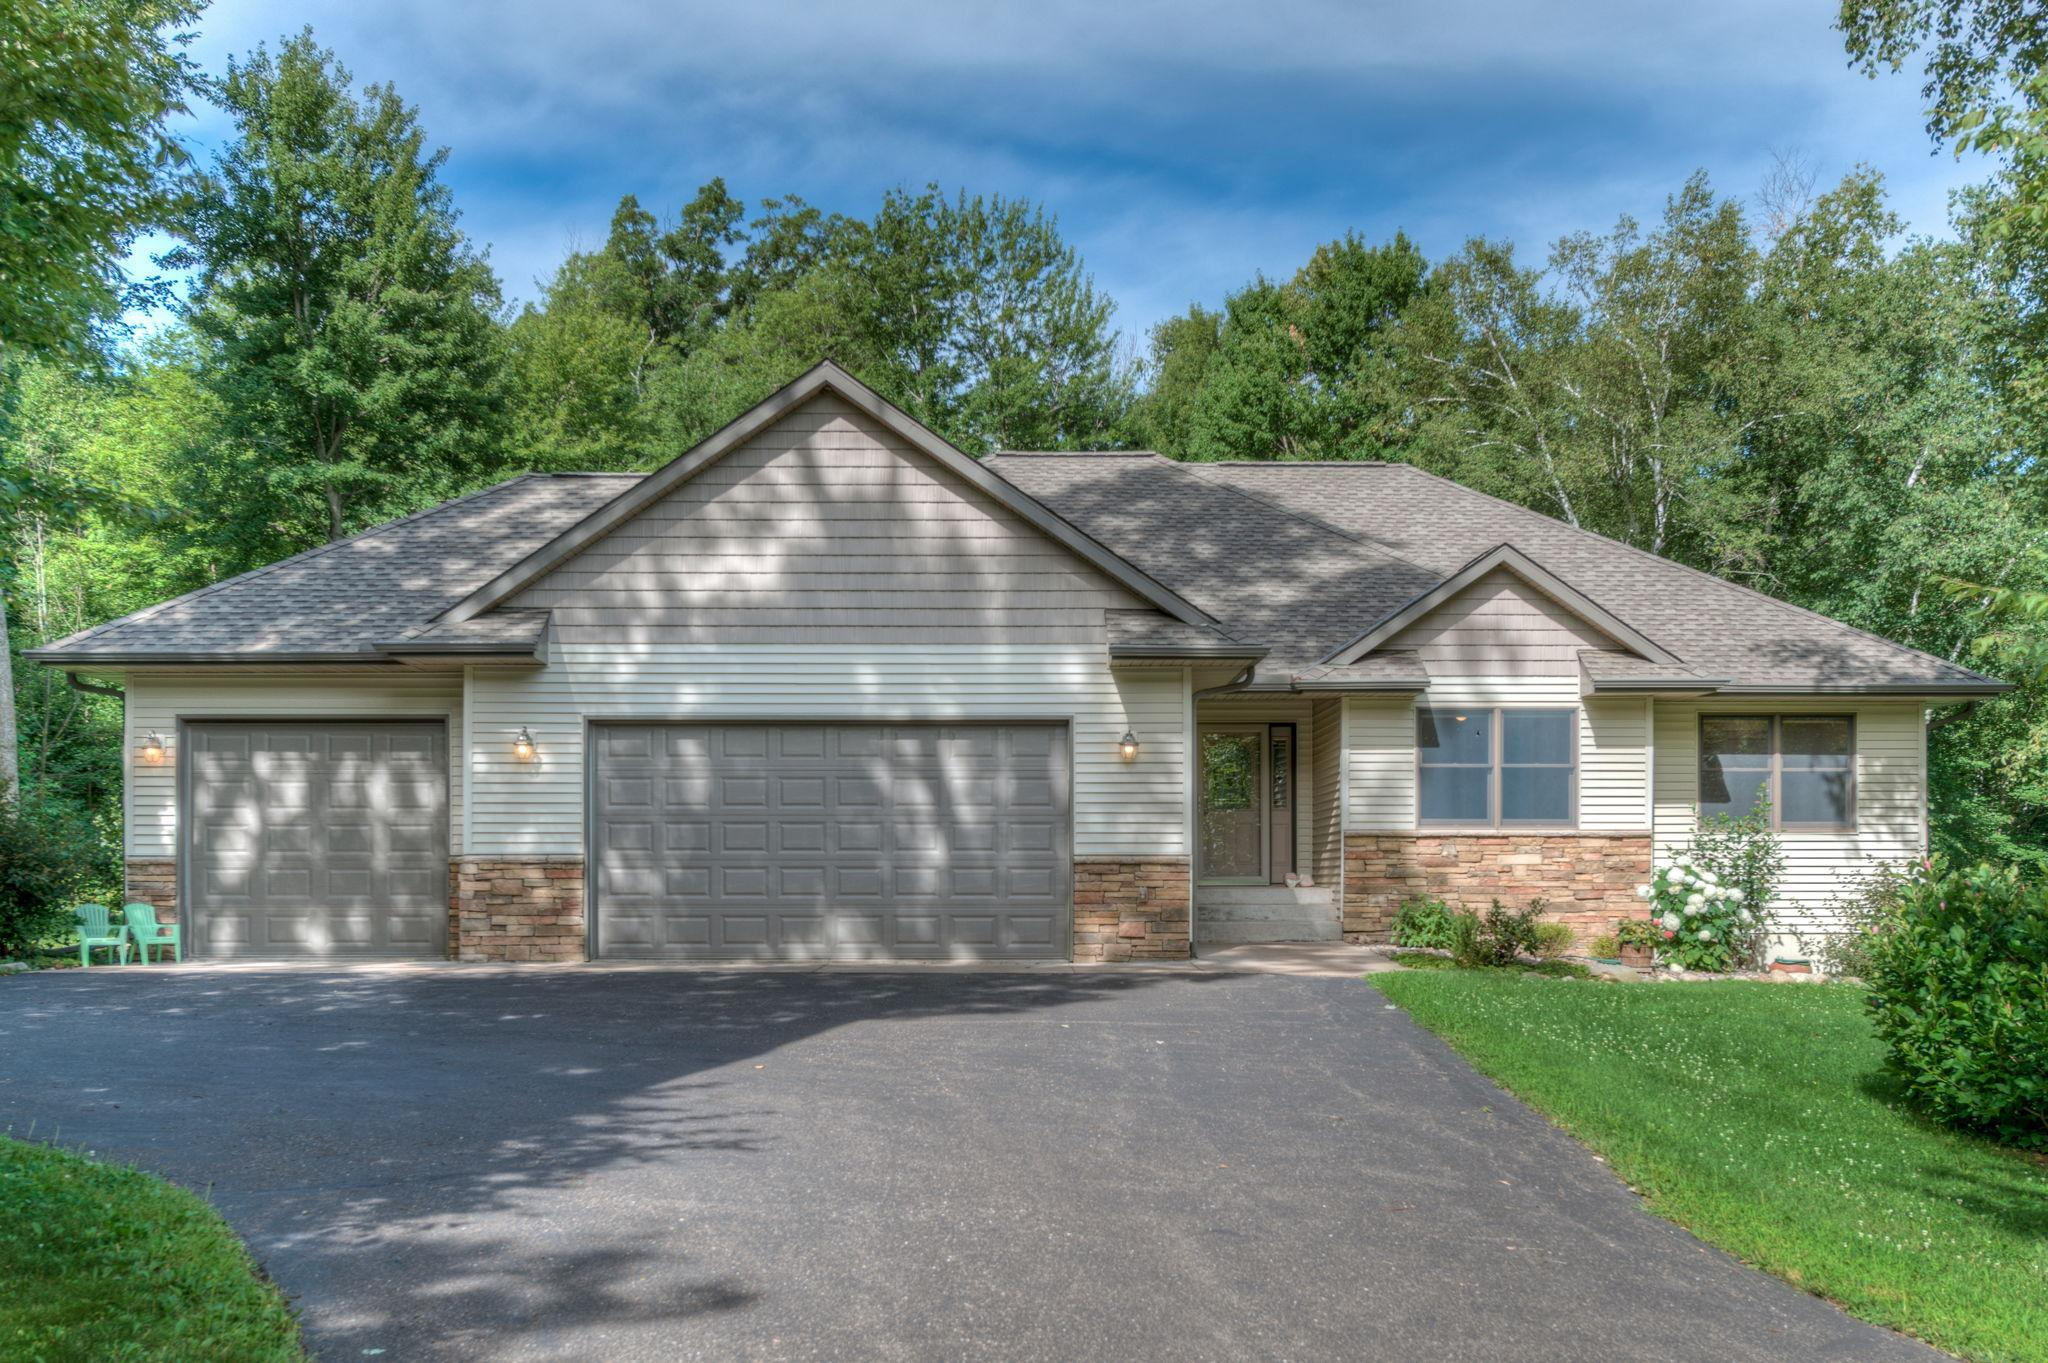 519 272nd Street Property Photo - Osceola, WI real estate listing